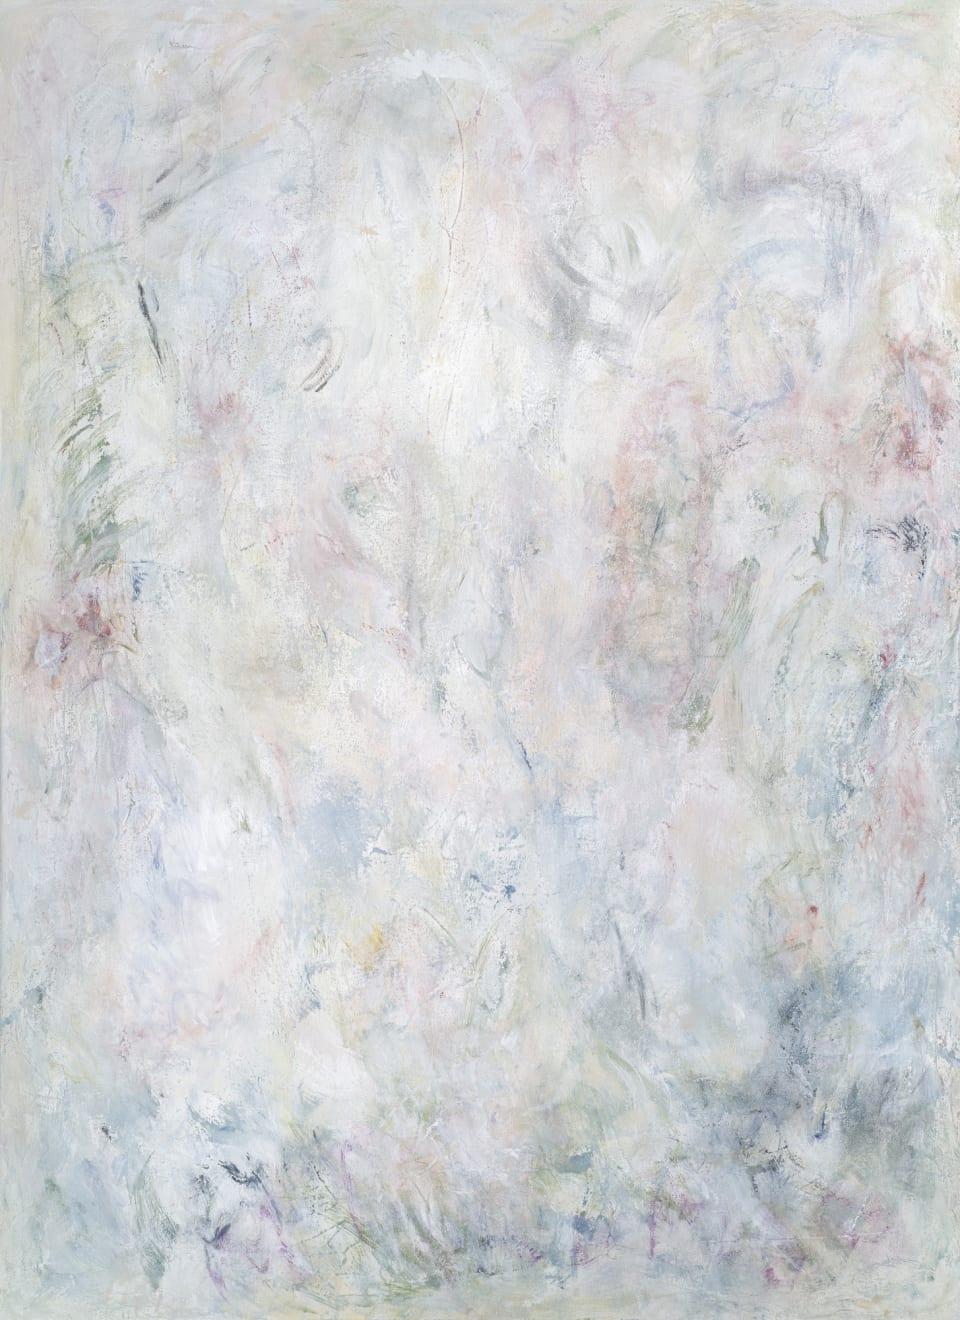 Patricia Qualls, Presence Series